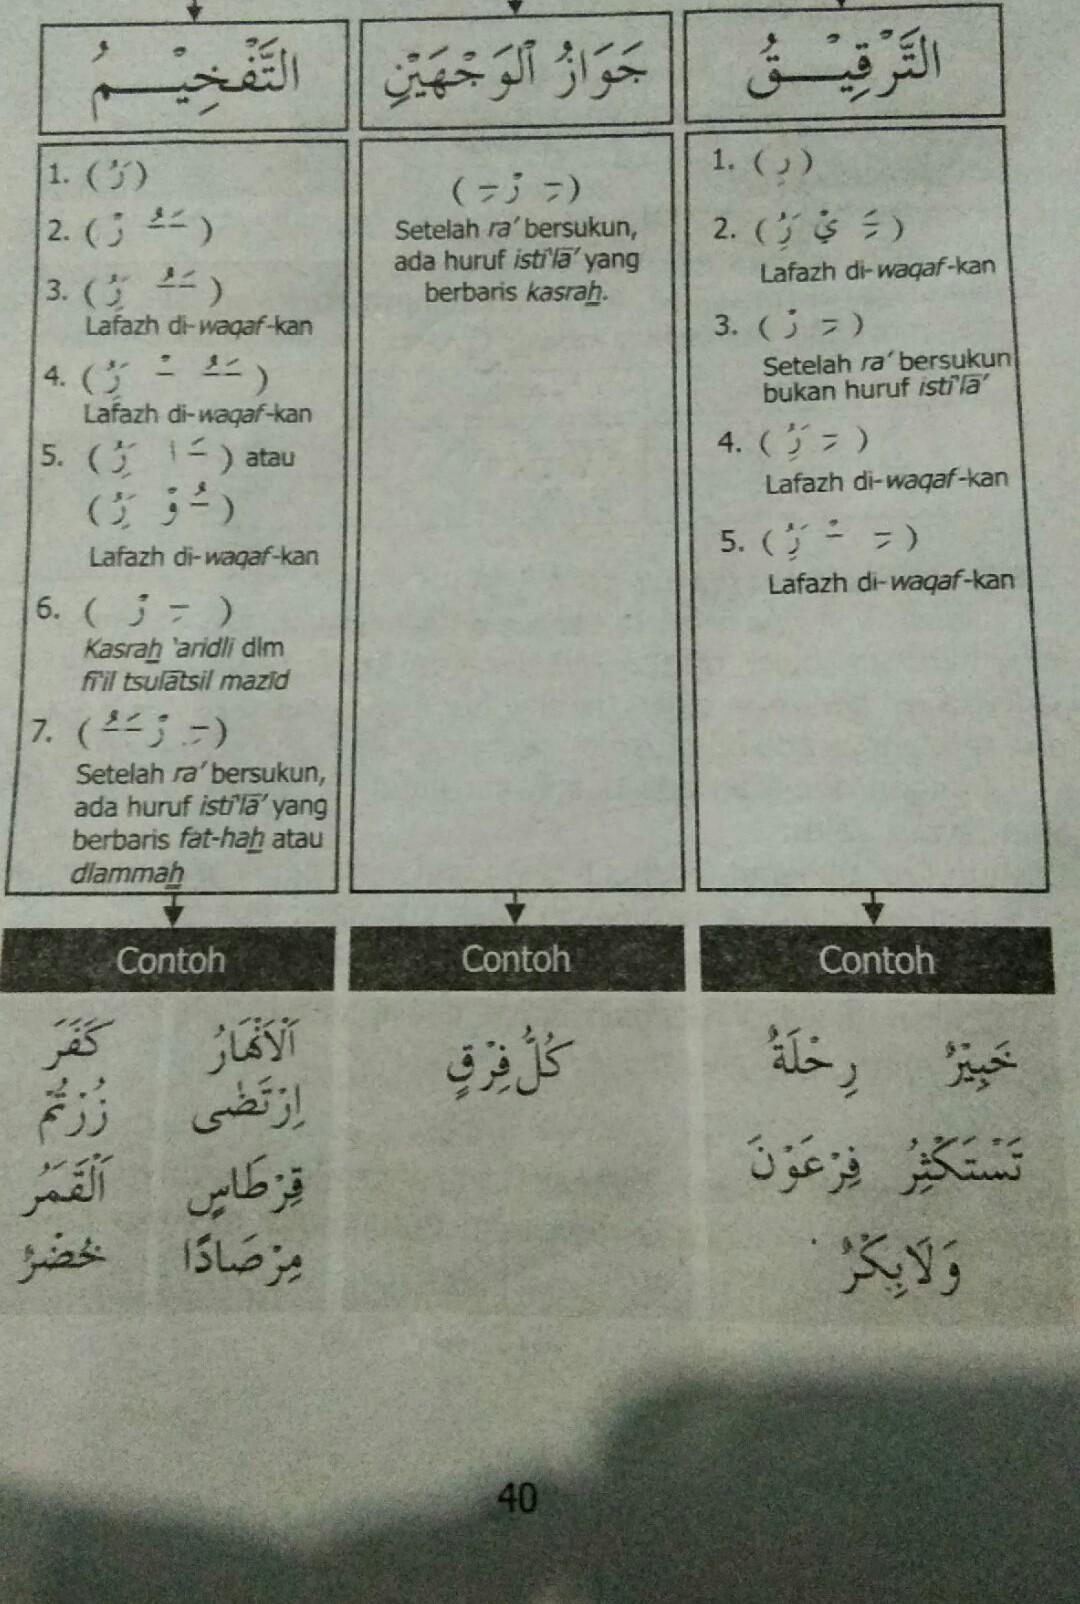 Ra Tarqiq Dan Tafkhim : tarqiq, tafkhim, Tuliskanlah, Masing, Contoh, Bacaan, Huruf, Dibaca, Tipis(tarqiq, ),tebal(tafkhim), Brainly.co.id